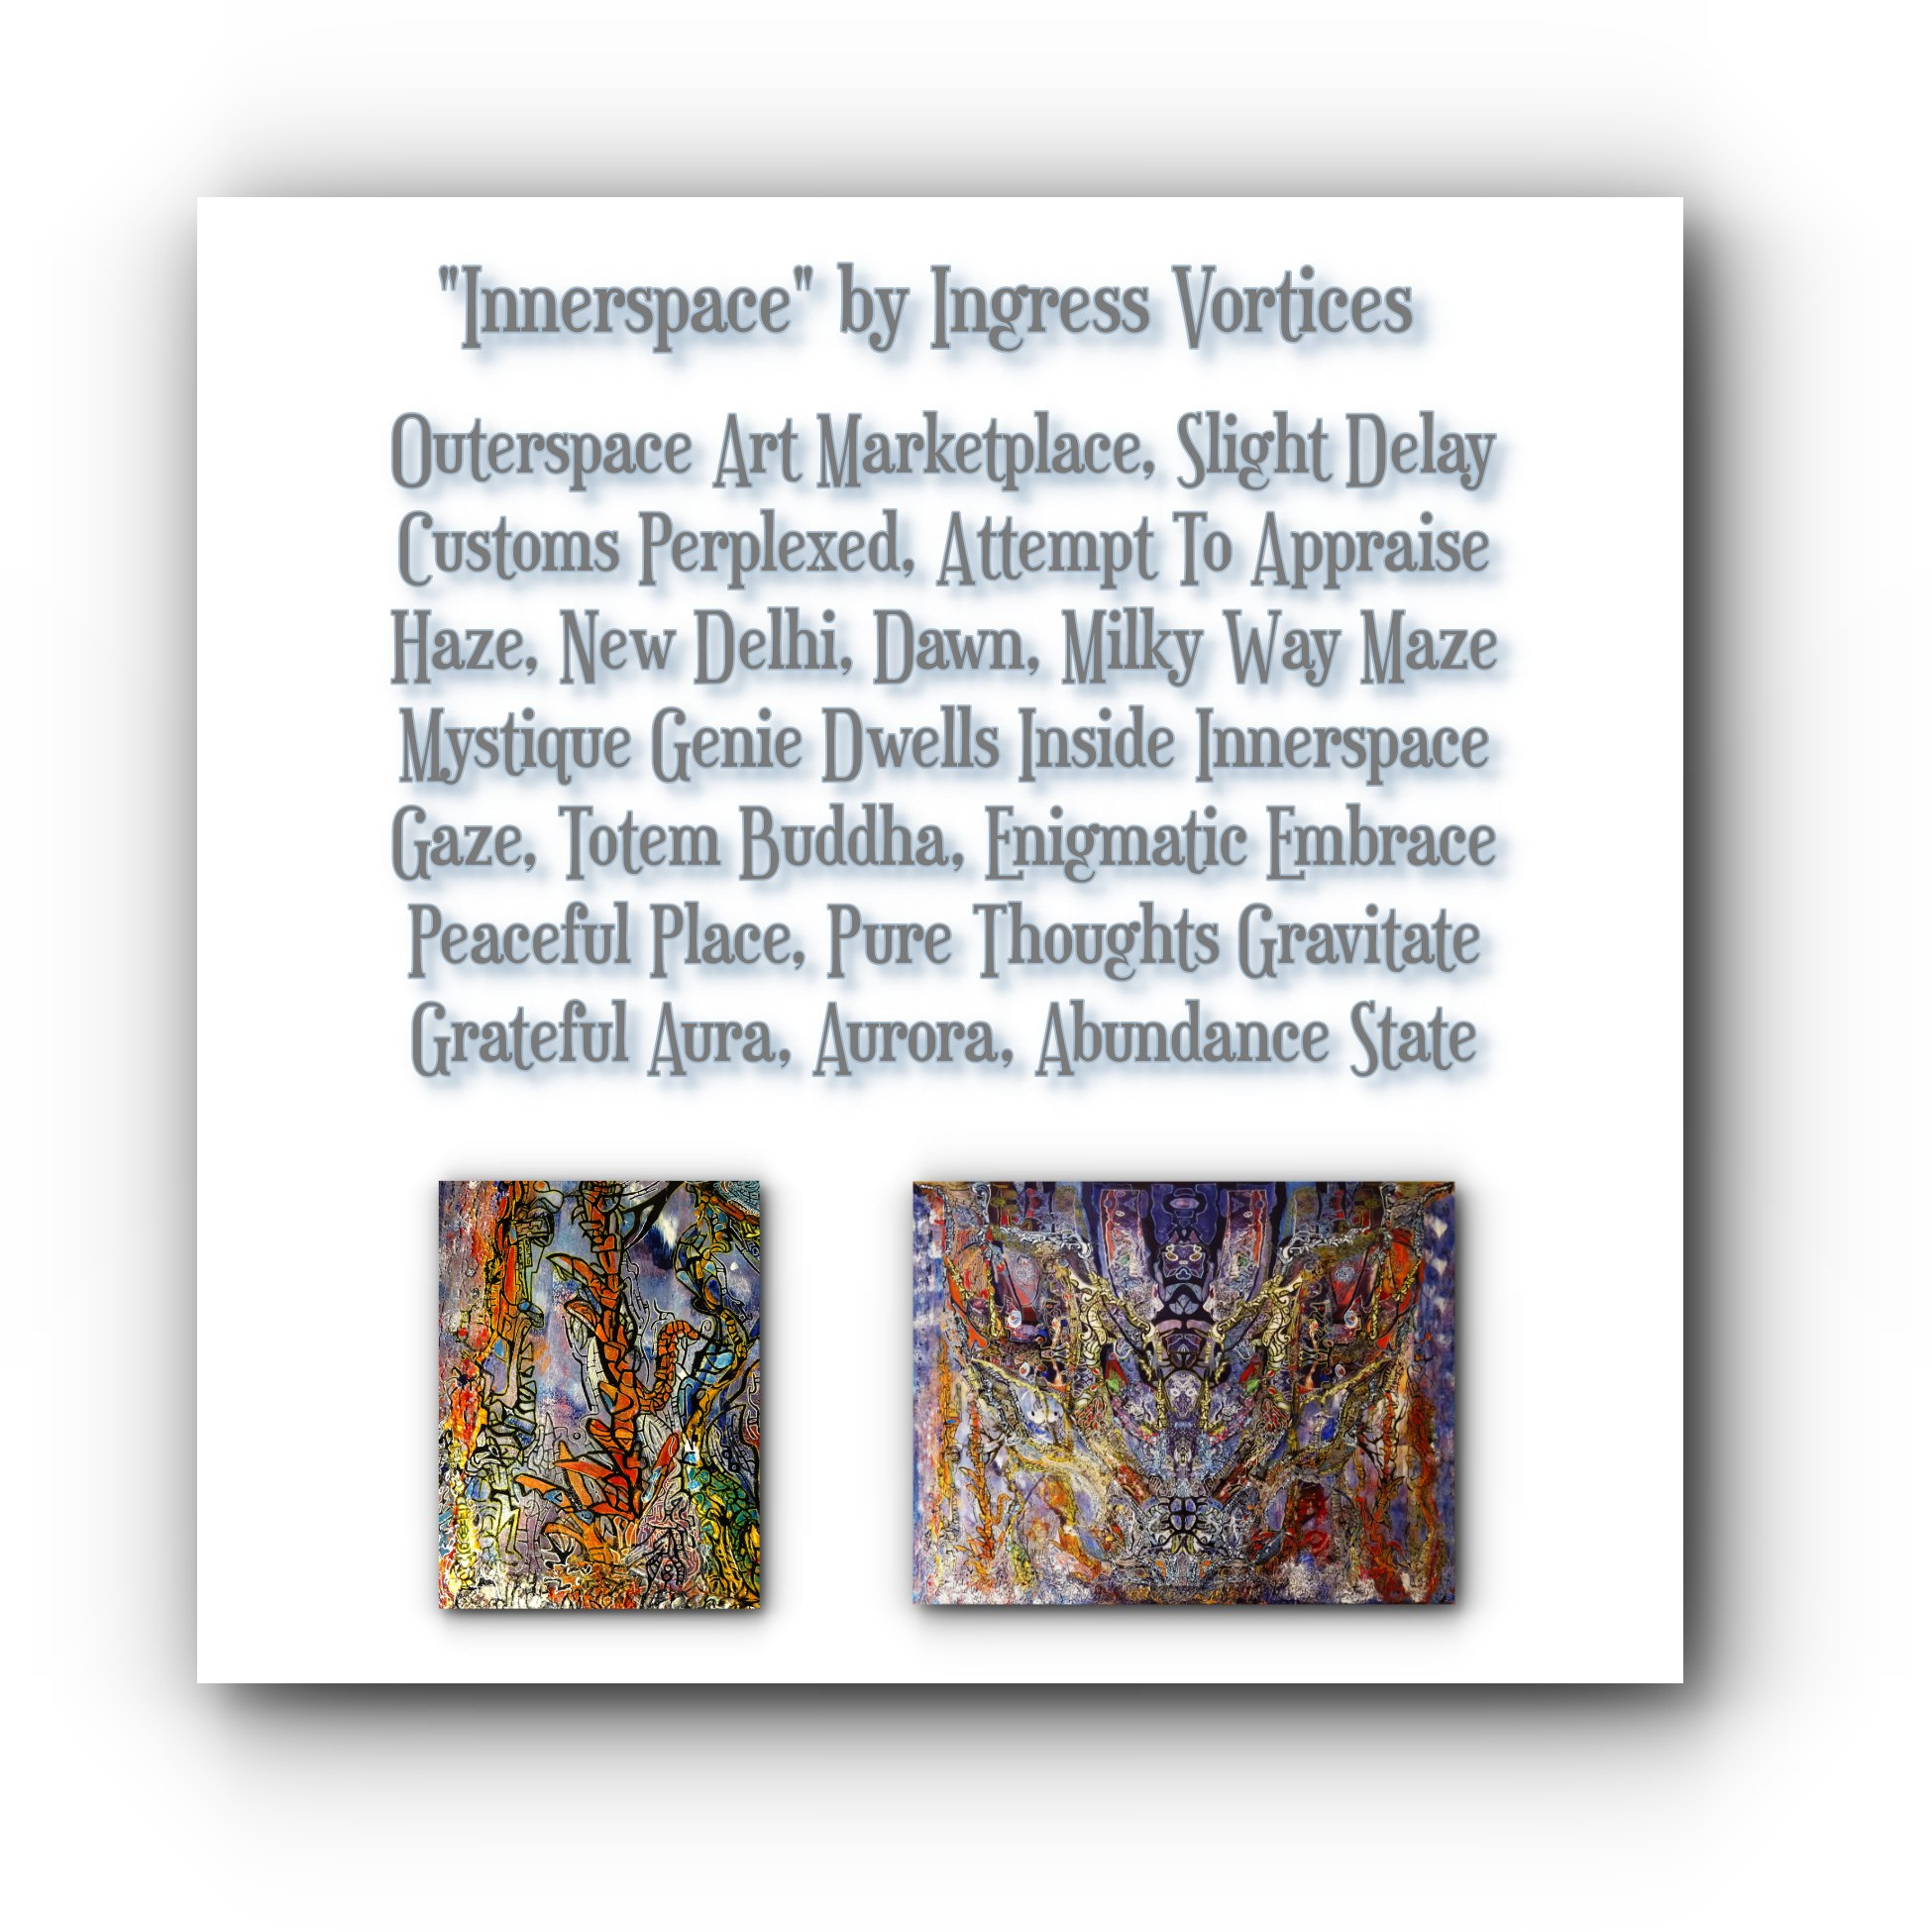 painting-collage-poem-innerspace-artist-duo-ingress-vortices.jpg